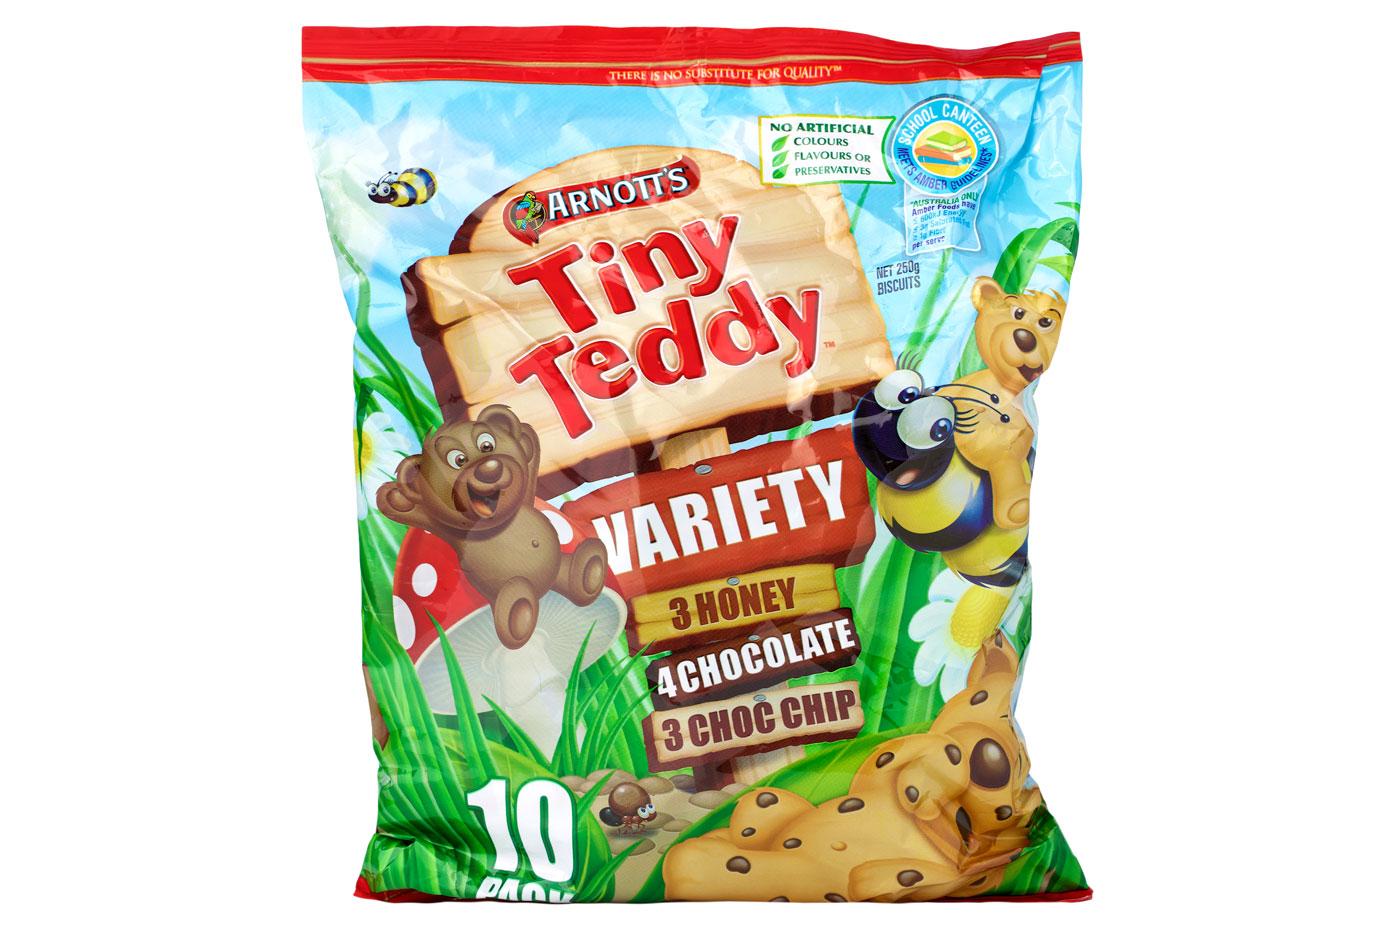 Tiny Teddy Chocolate: 0.5g sugar per biscuit (1 teaspoon = 4g sugar)